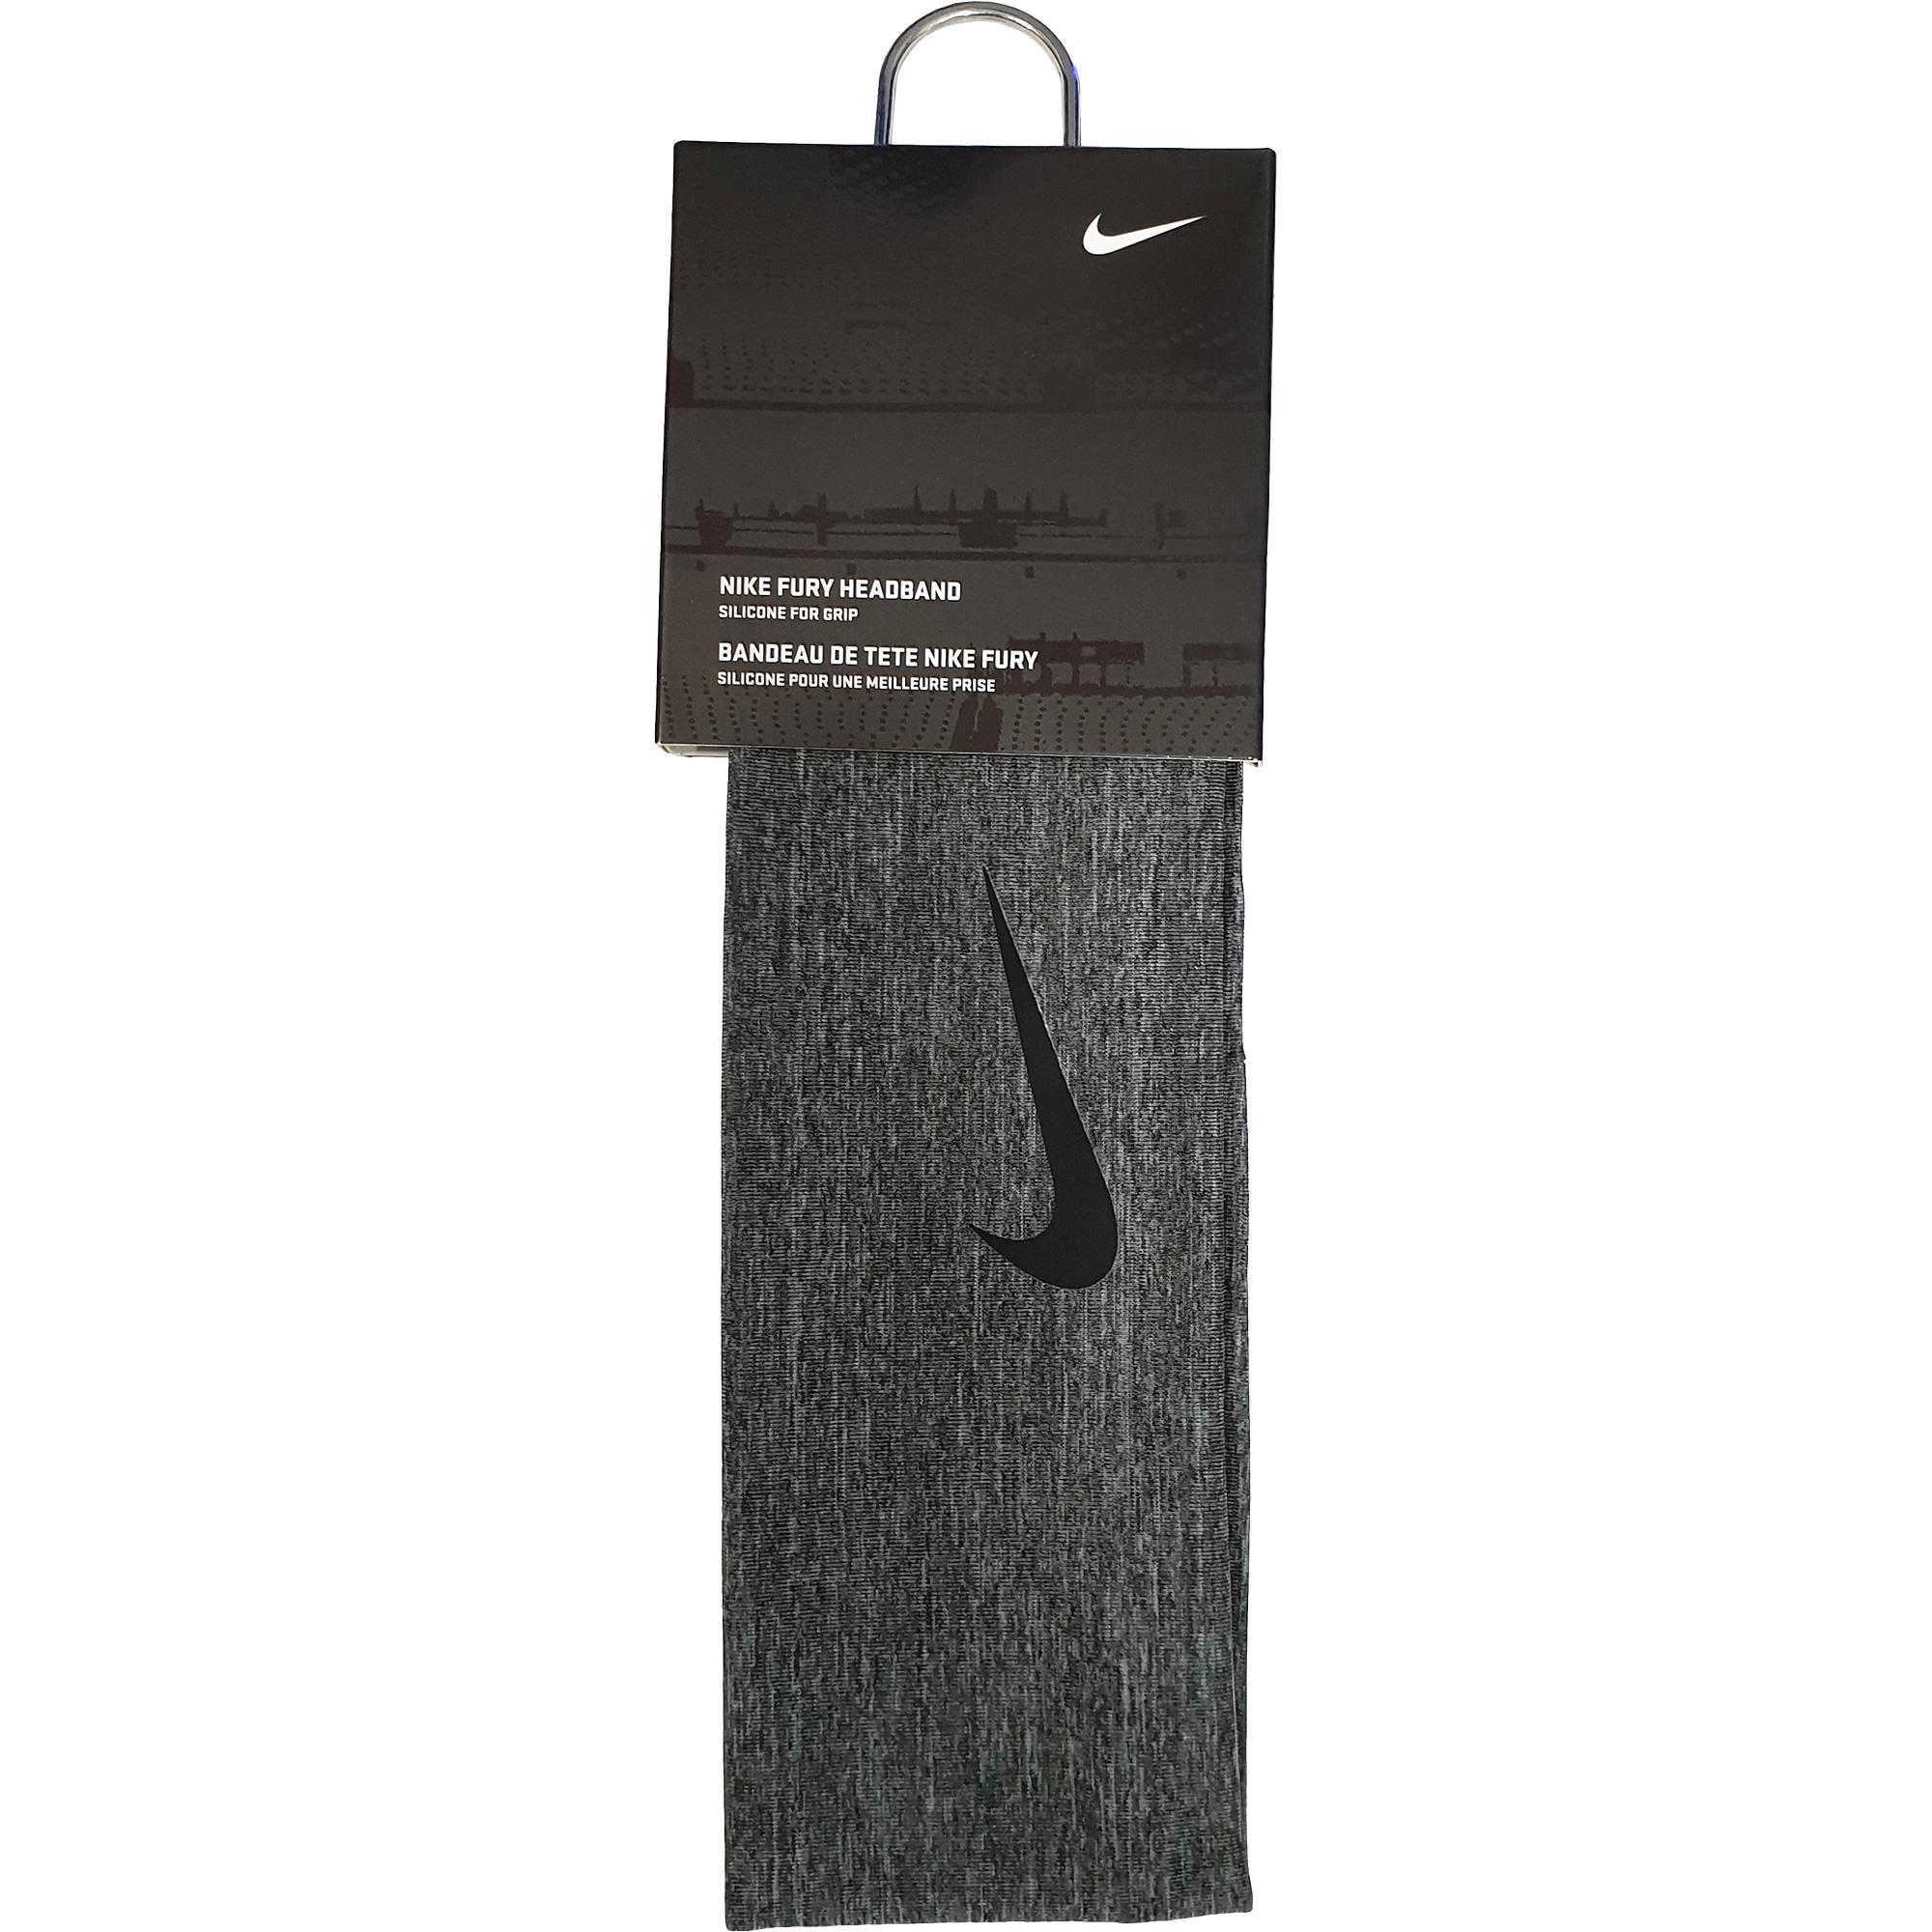 Nike Fury Headband 2.0 - Charcoal Heather Black - Tennisnuts.com fa8277dc317